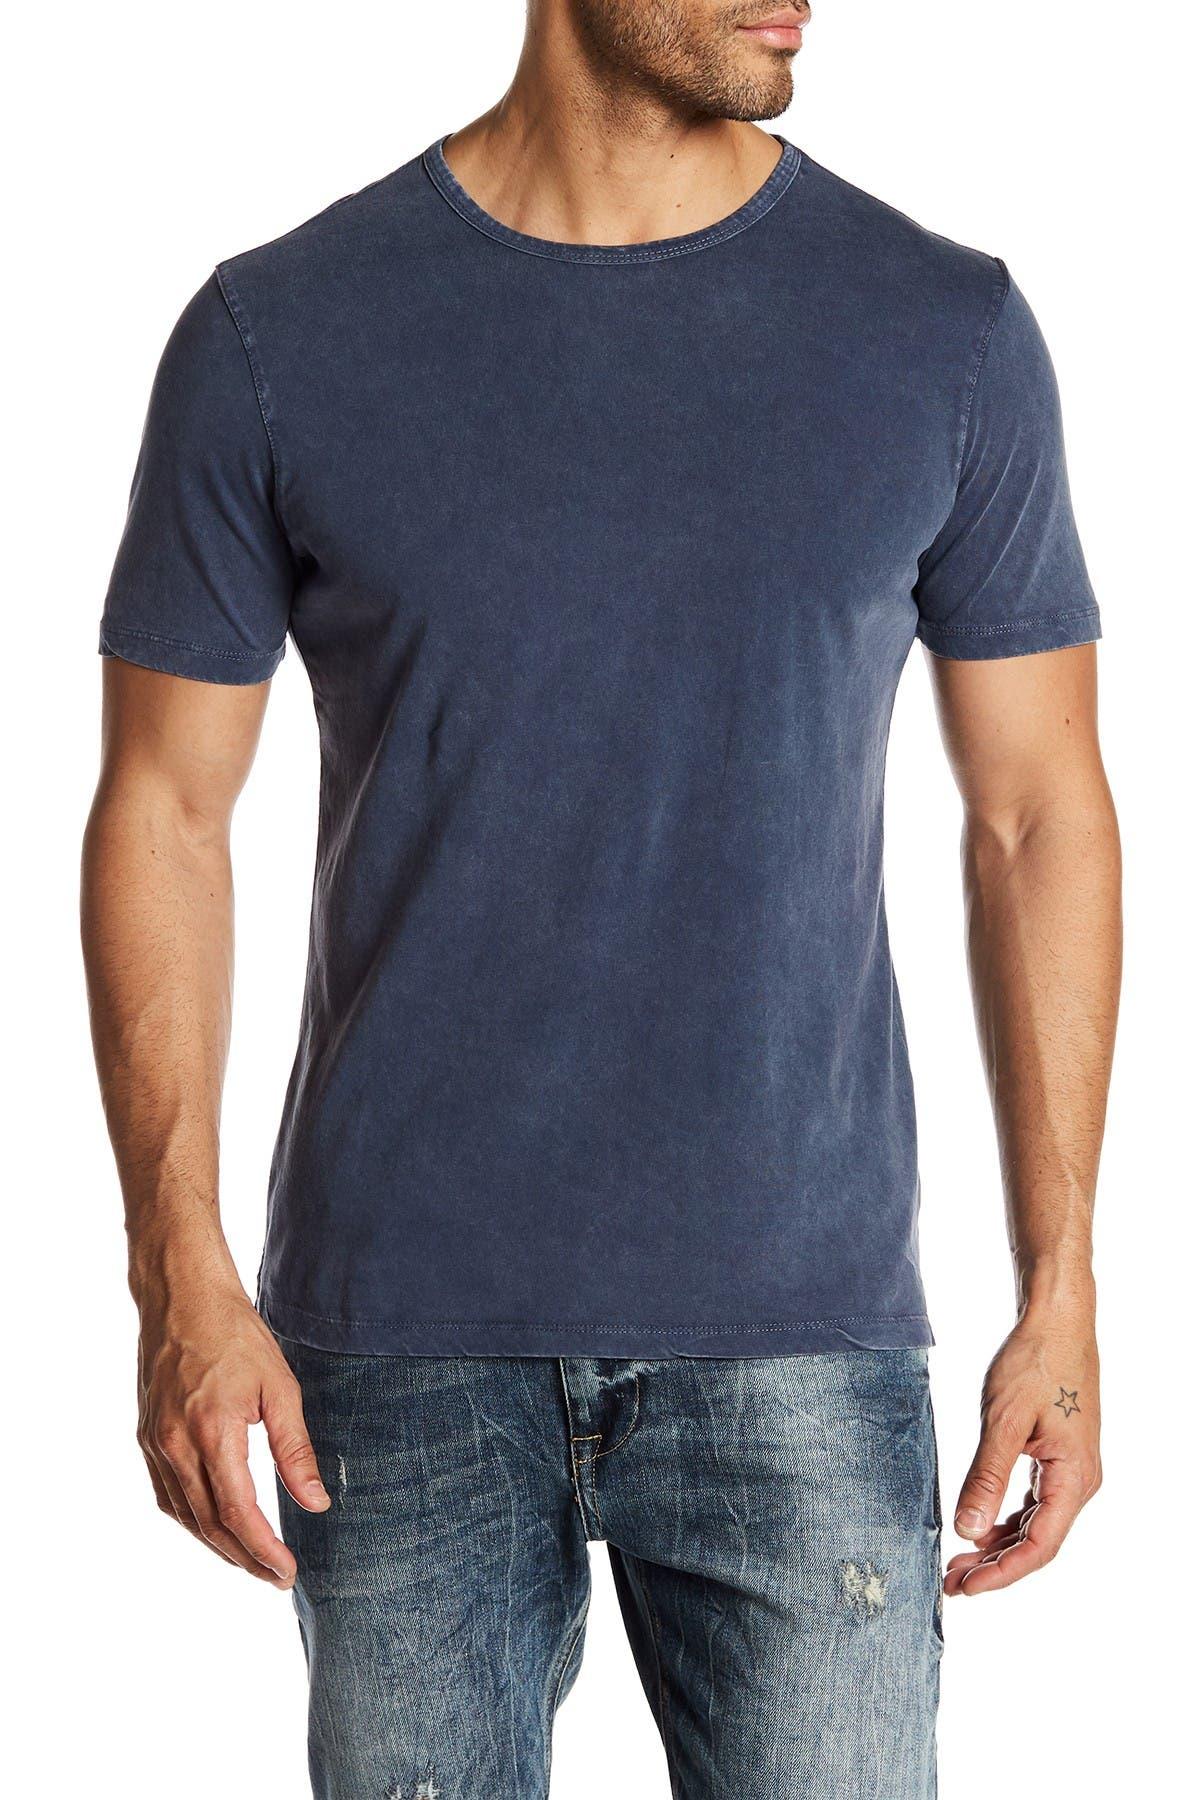 Image of ROBERT BARAKETT Kentville Short Sleeve T-Shirt